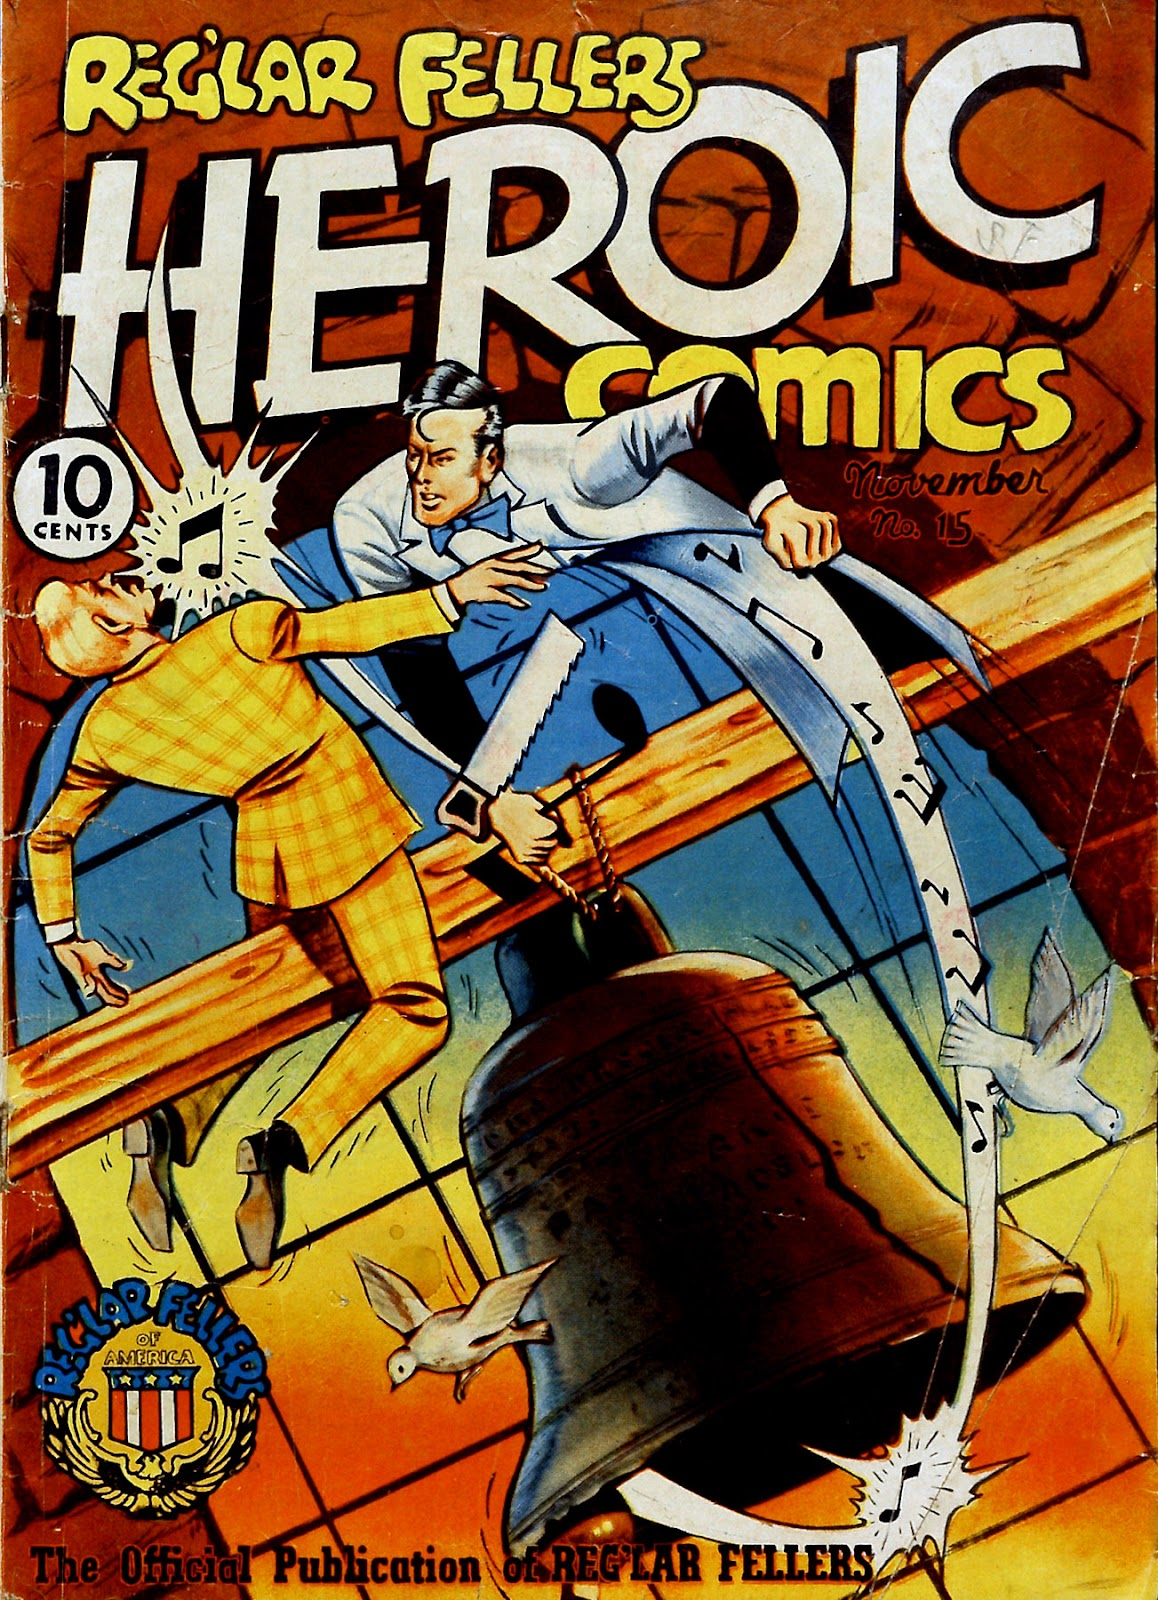 Reglar Fellers Heroic Comics issue 15 - Page 1